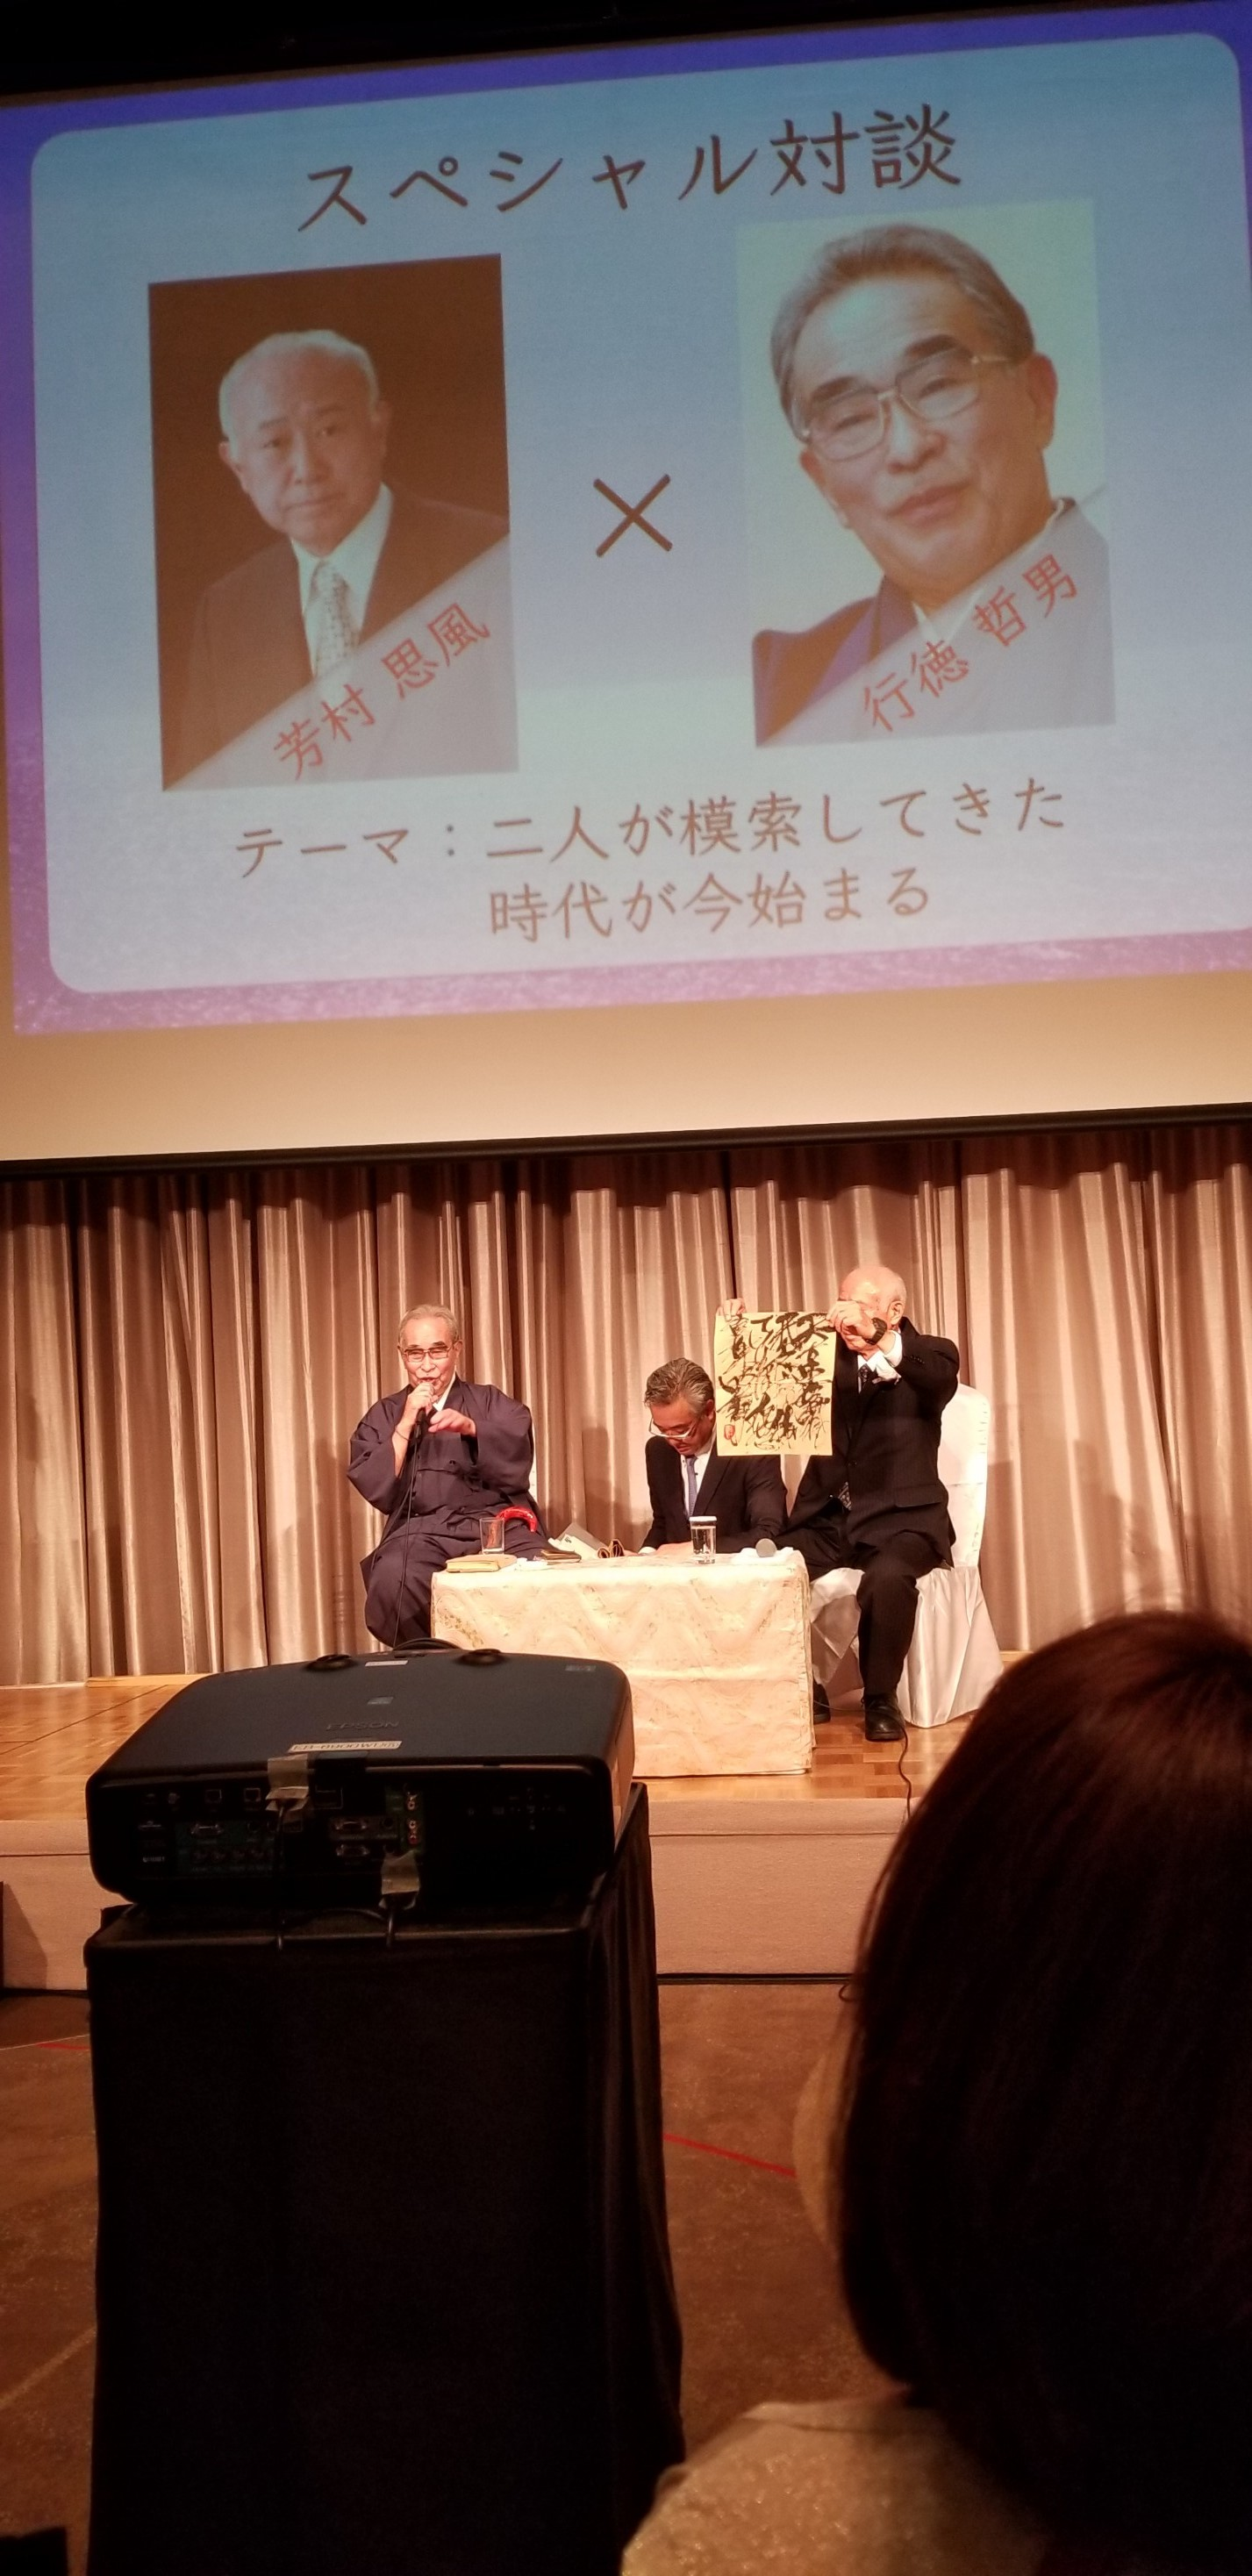 2438997b942adf0998fd928a3504b481 - 第6回思風会全国大会2018in東京開催